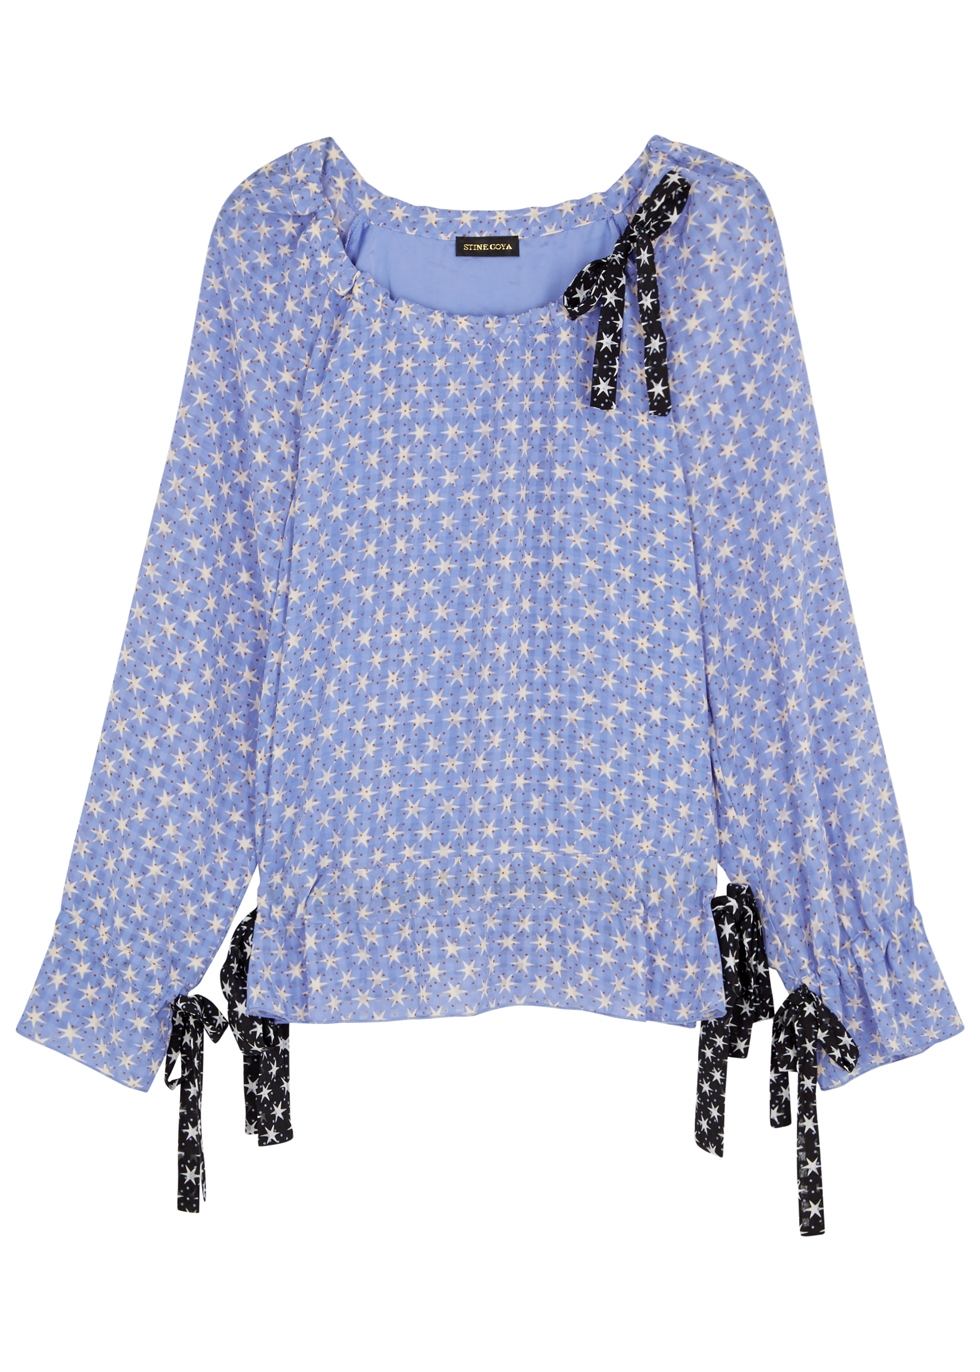 STINE GOYA MALLOW BLUE STAR-PRINT TOP